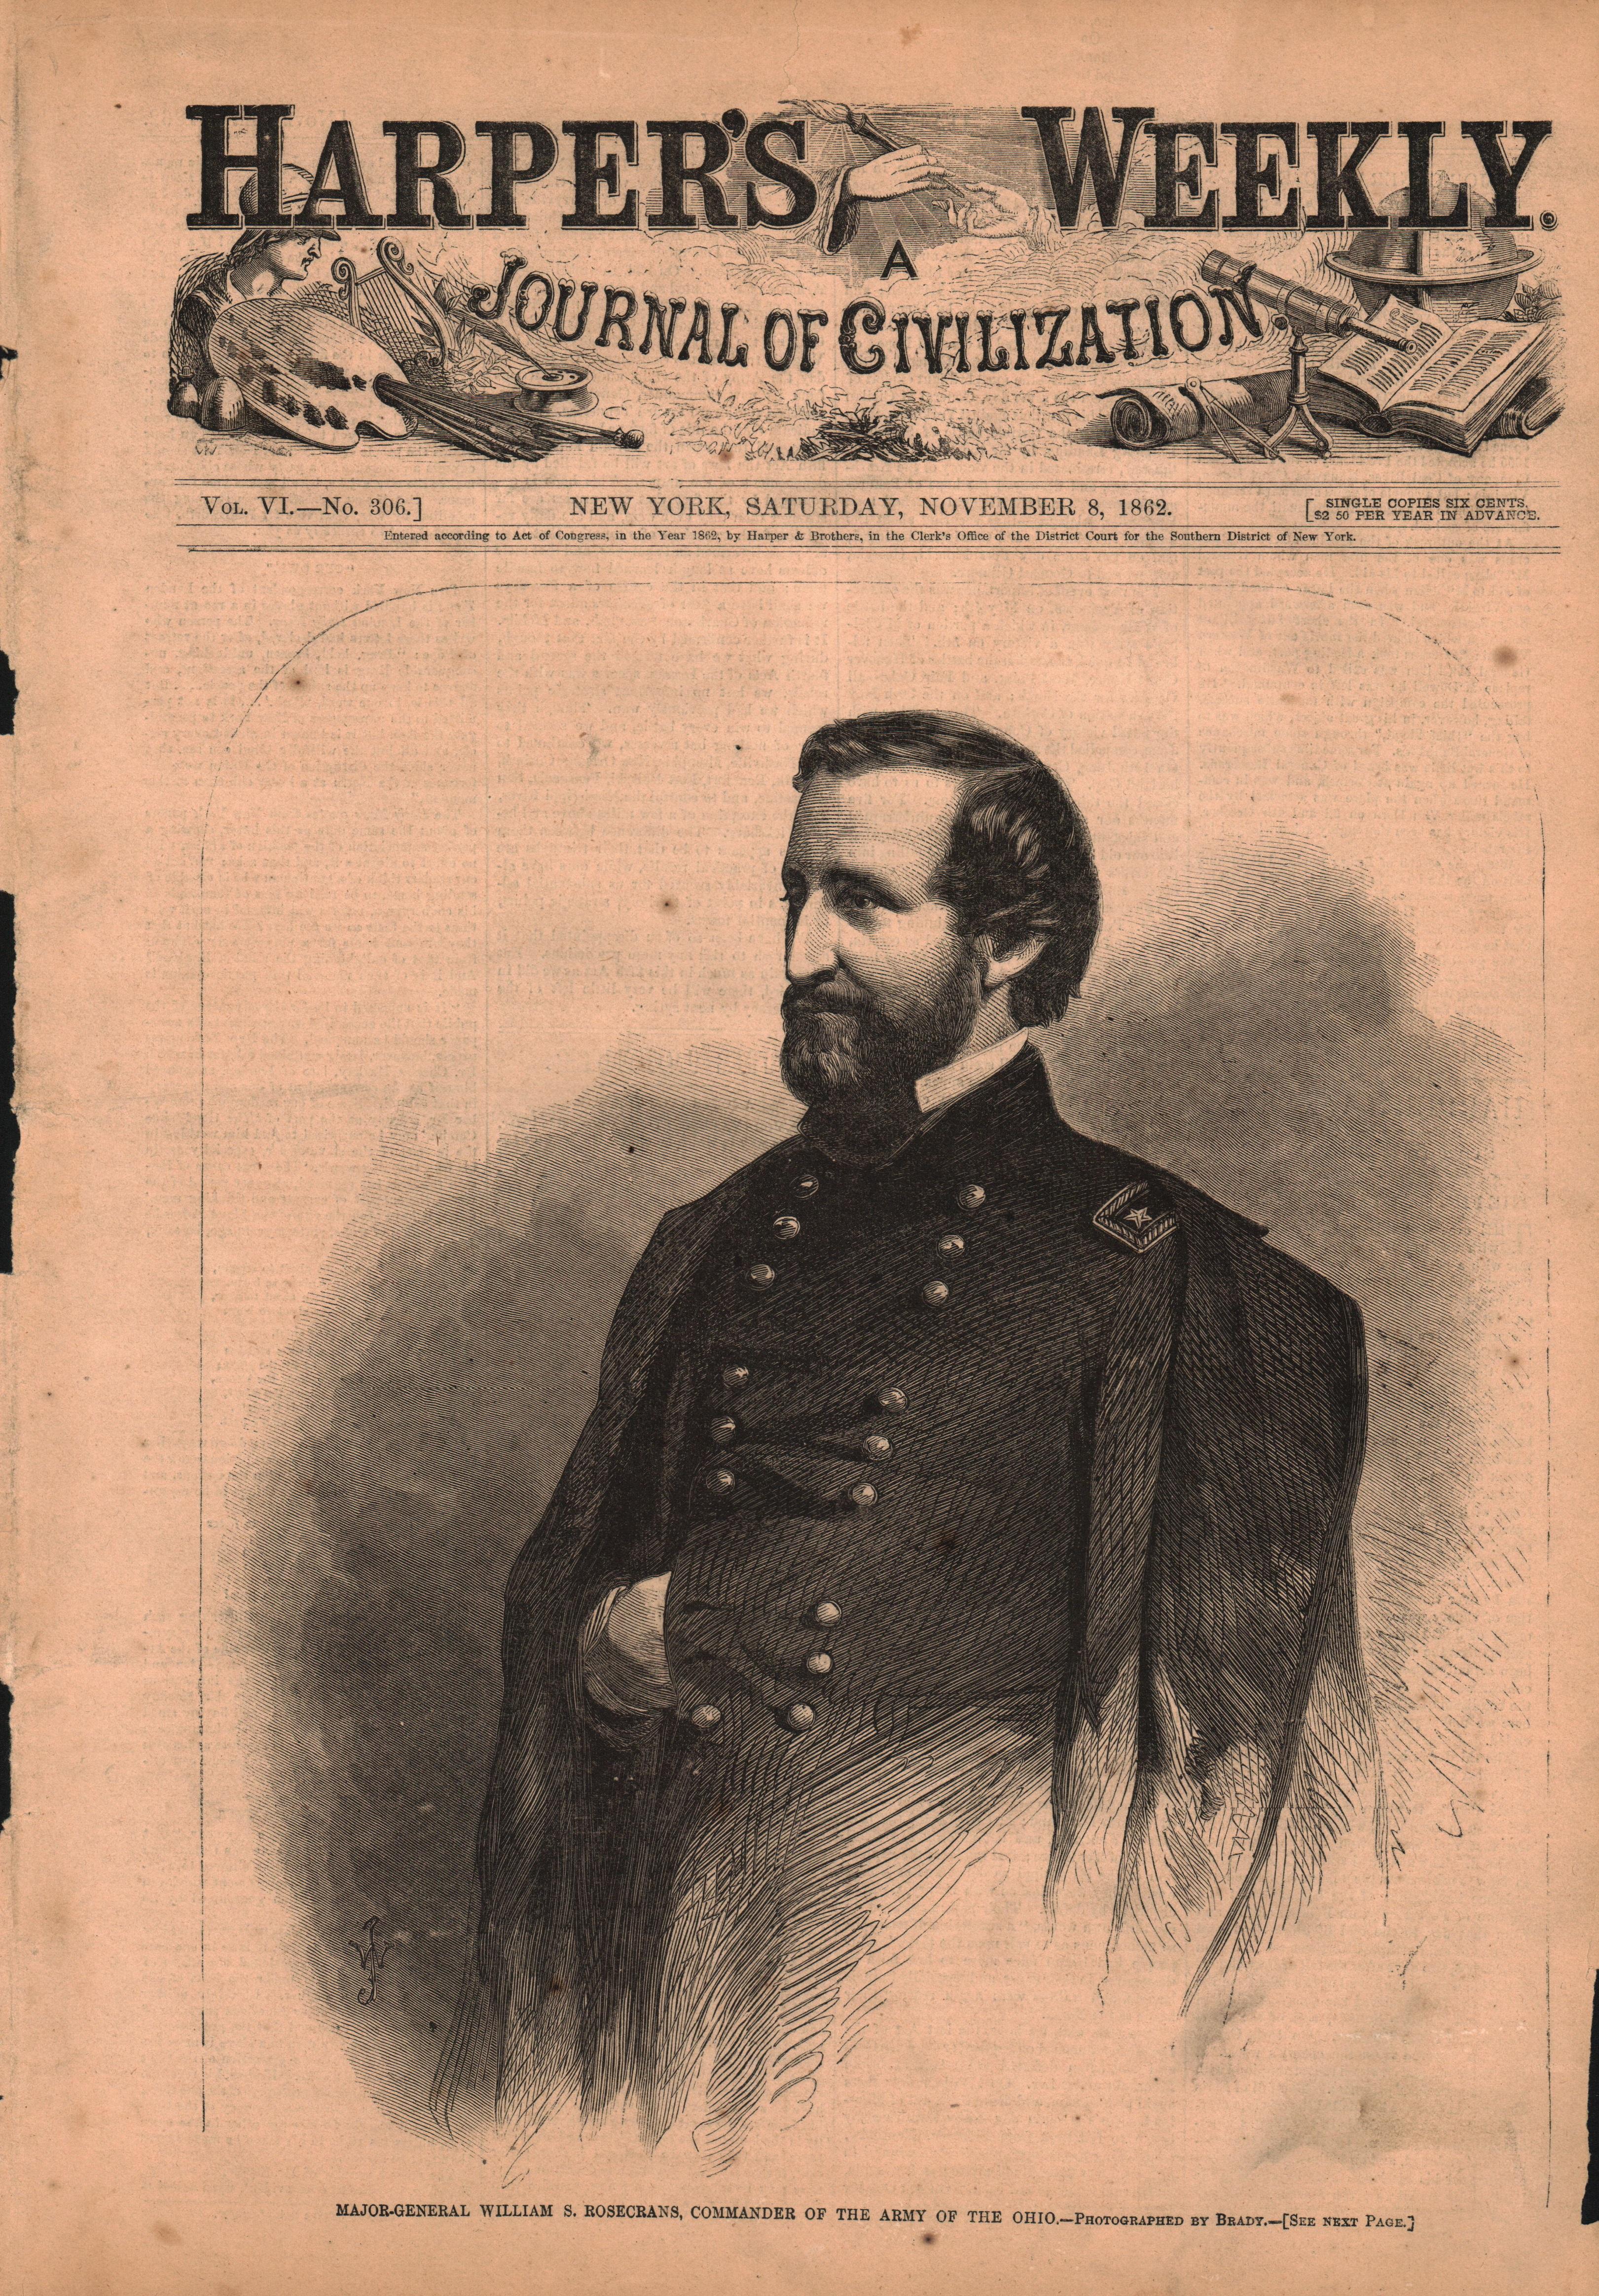 Major Ganeral William S. Rosecrans